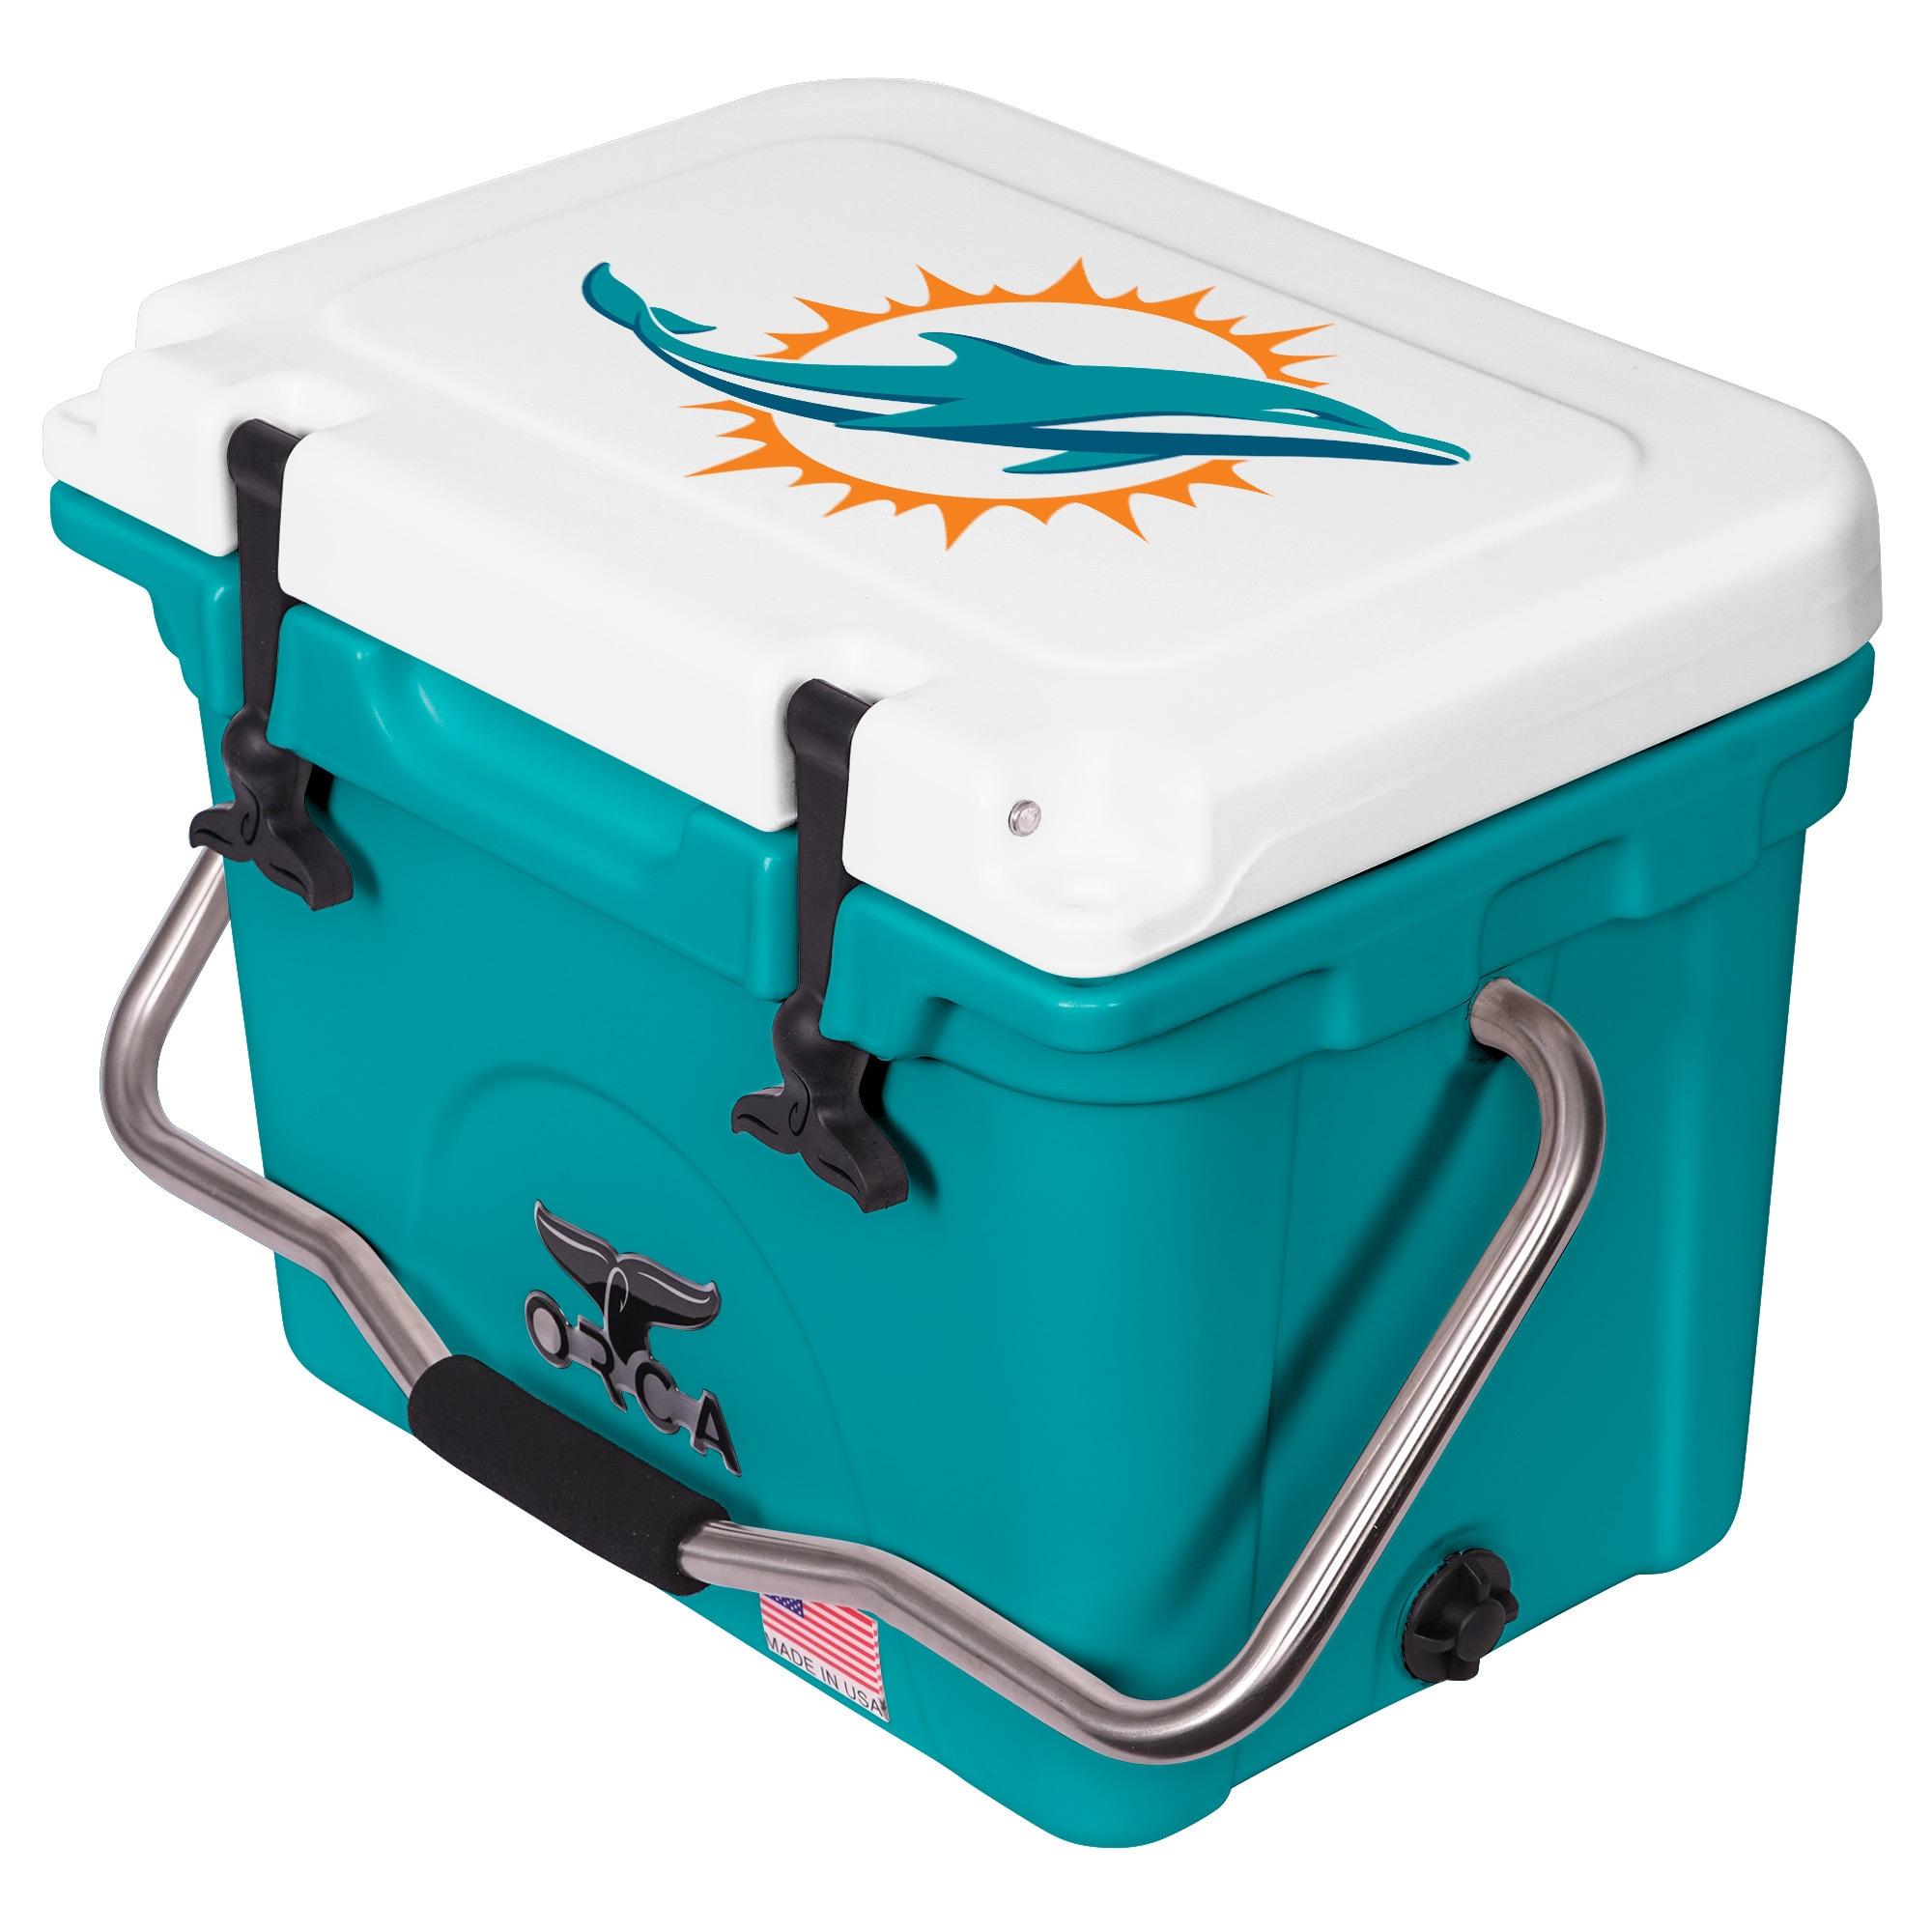 Miami Dolphins ORCA 20-Quart Hard-Sided Cooler - Aqua/White